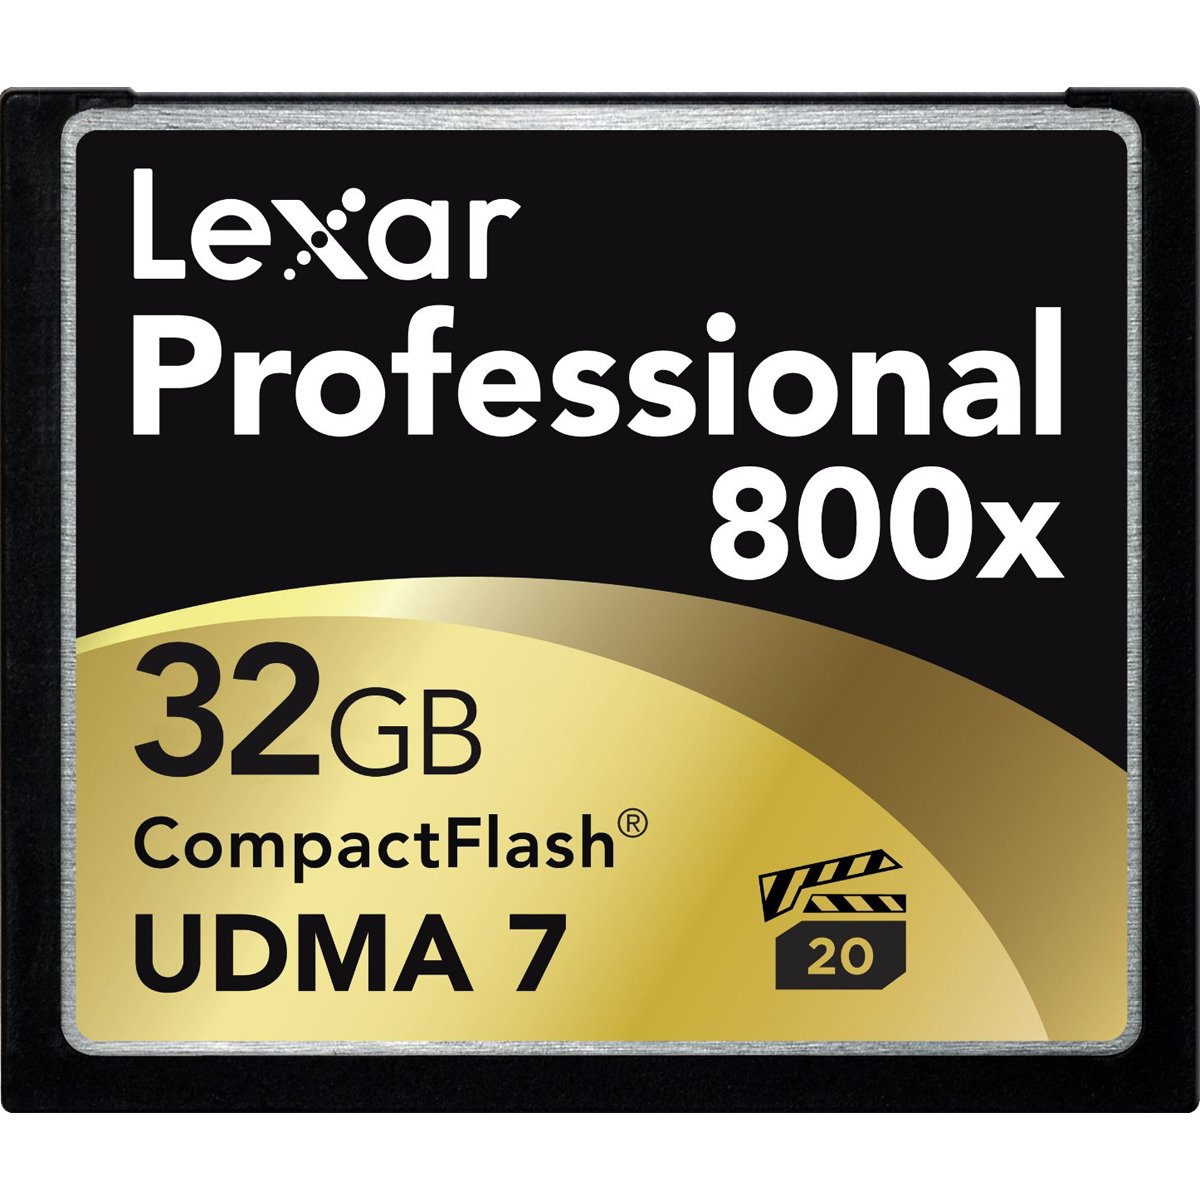 Amazon.com: TARJETA COMPACT FLASH LEXAR PROFESIONAL 800X ...